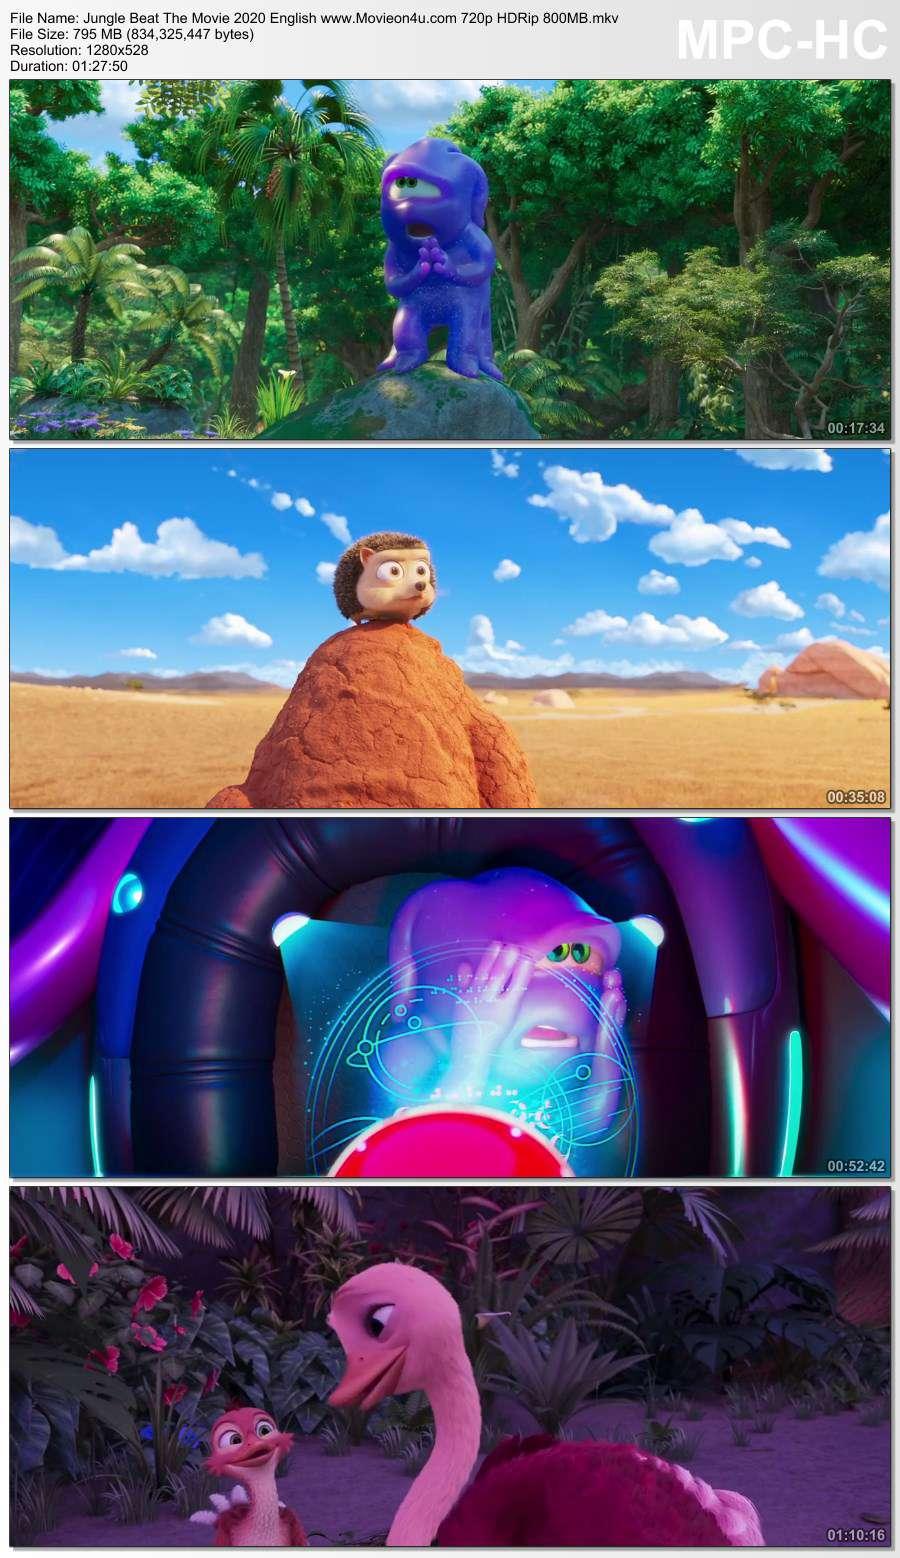 Jungle Beat: The Movie 2020 English 720p HDRip x264 800MB Download HD